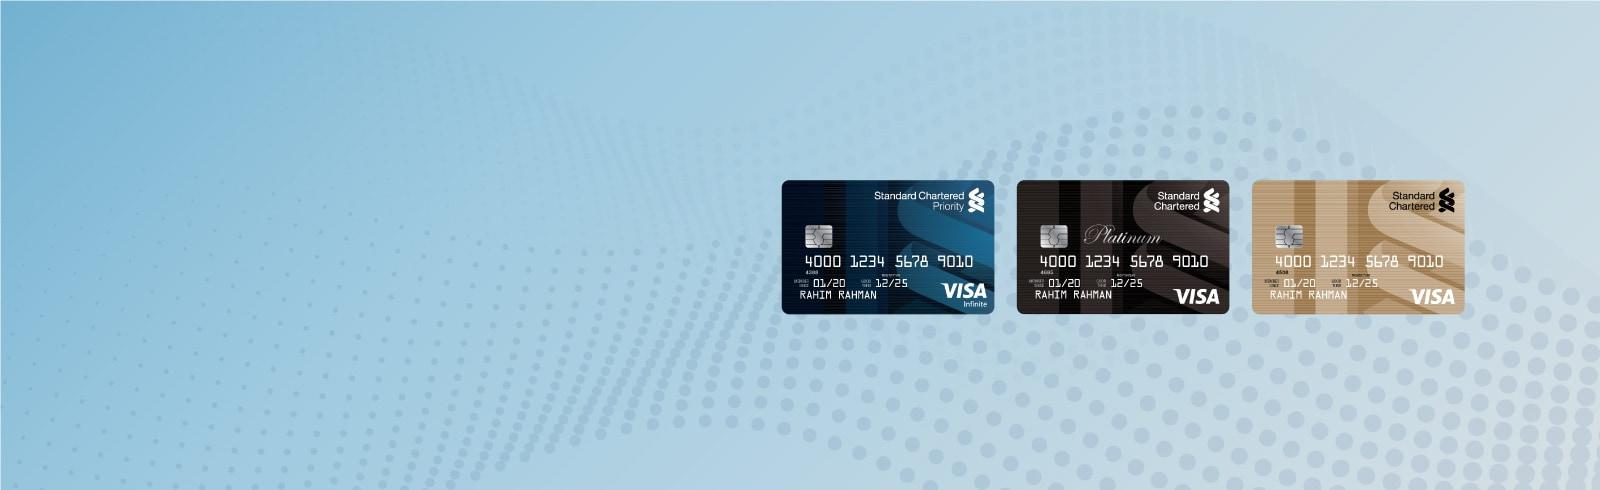 Bn olympic games tokyo banner new visa card x y